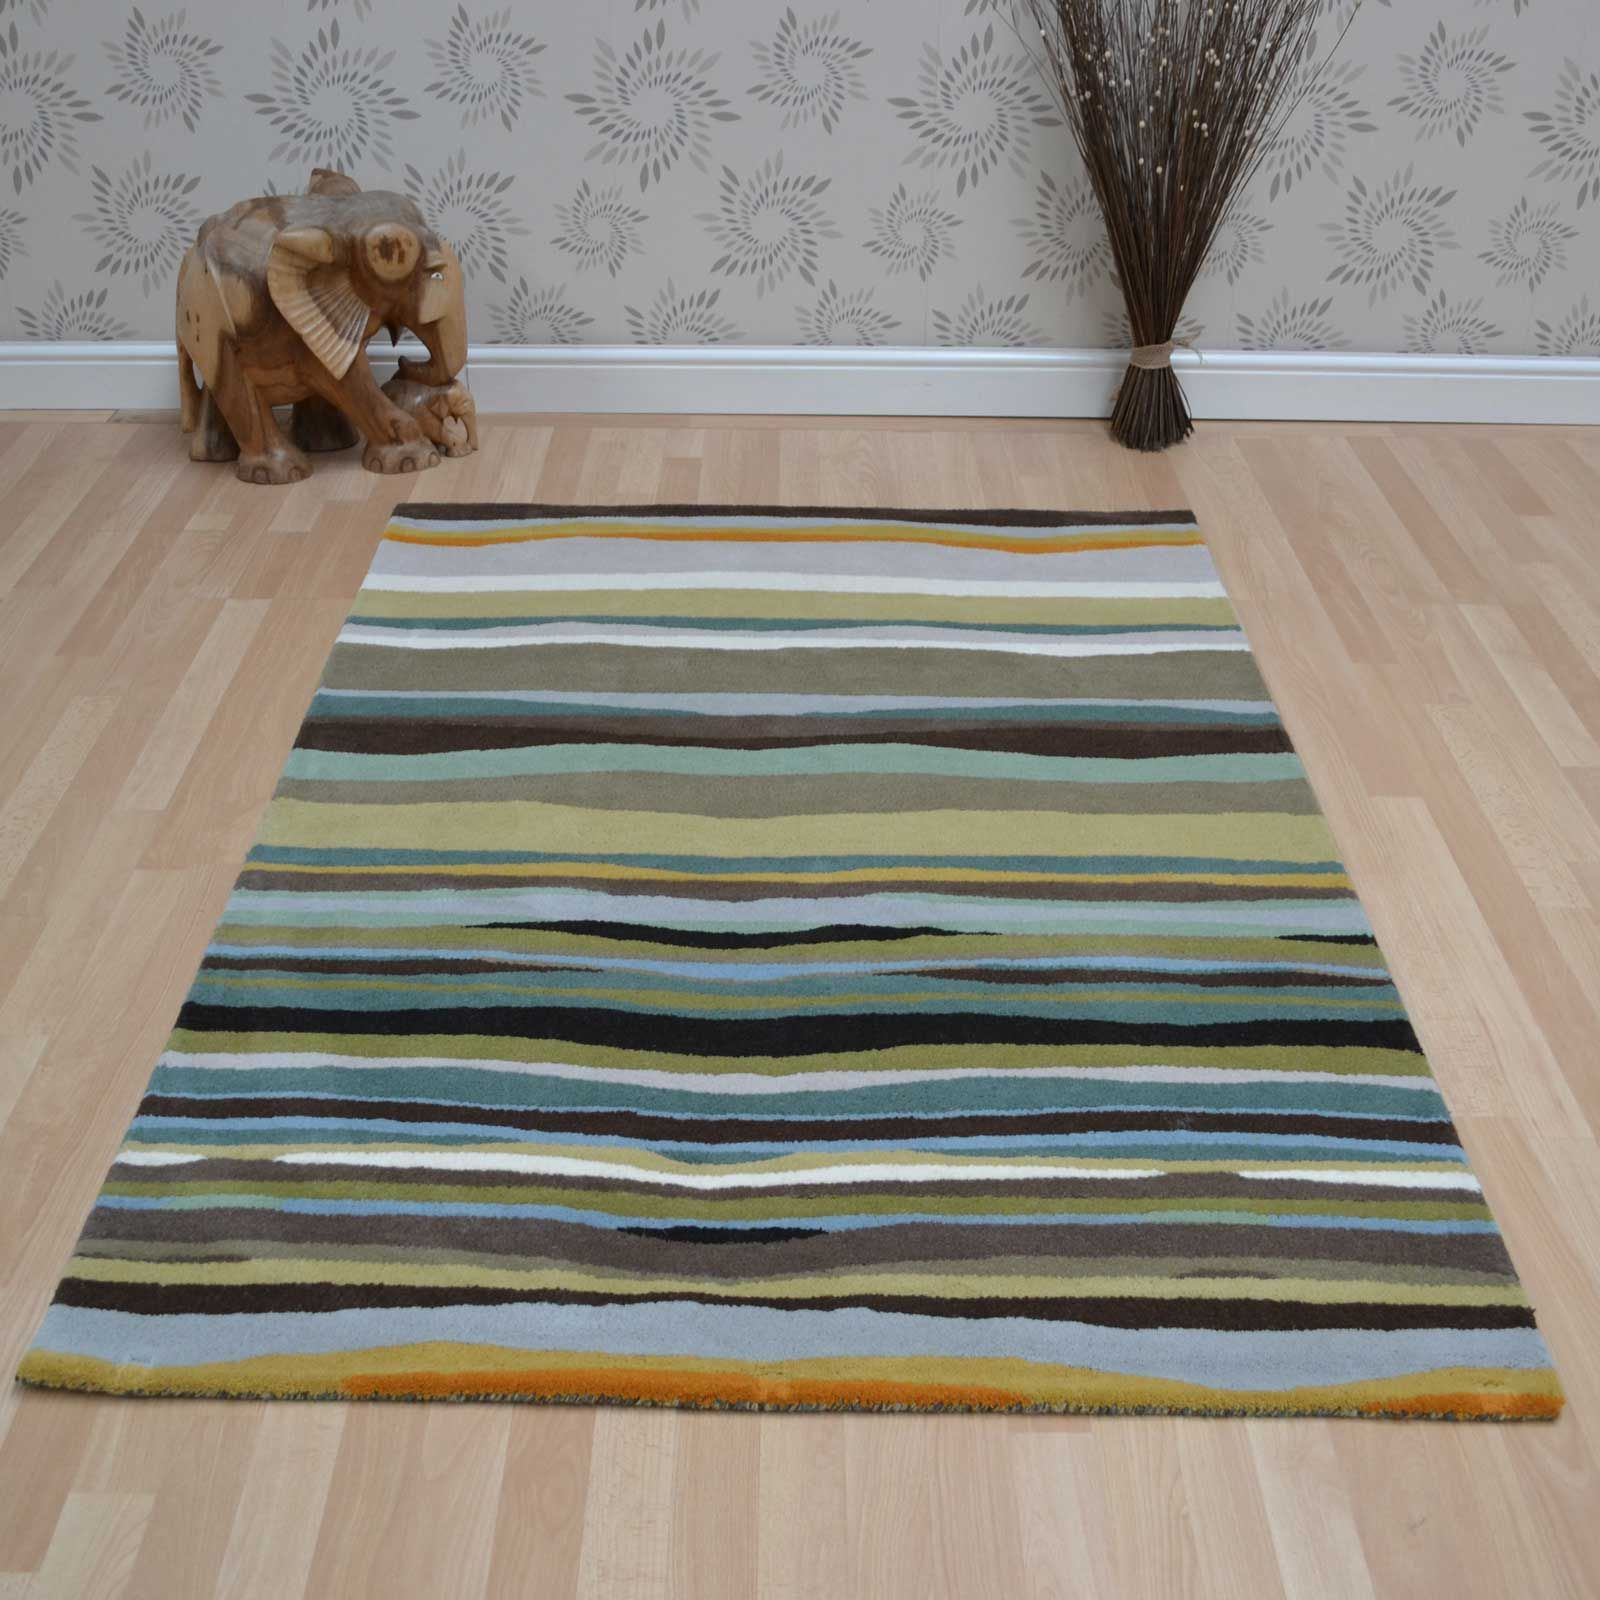 Estella Summer 85207 Wool Rugs By Brink Campman